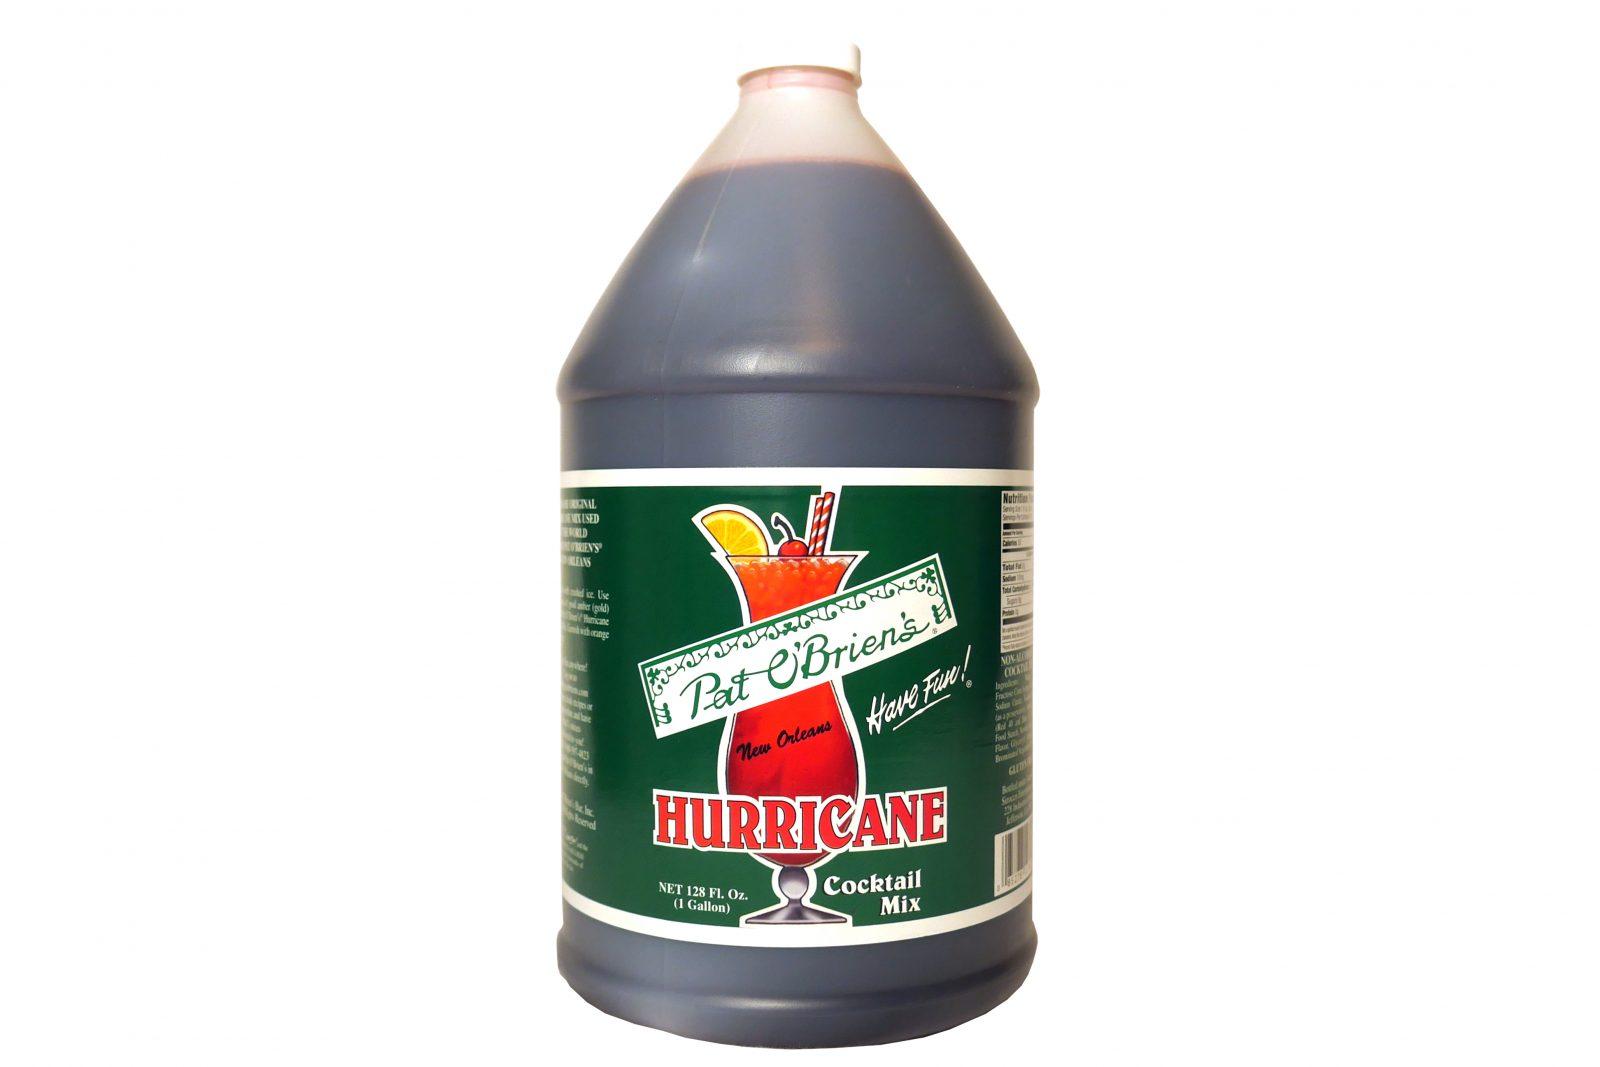 Pat o'brien's hurricane mix walmart